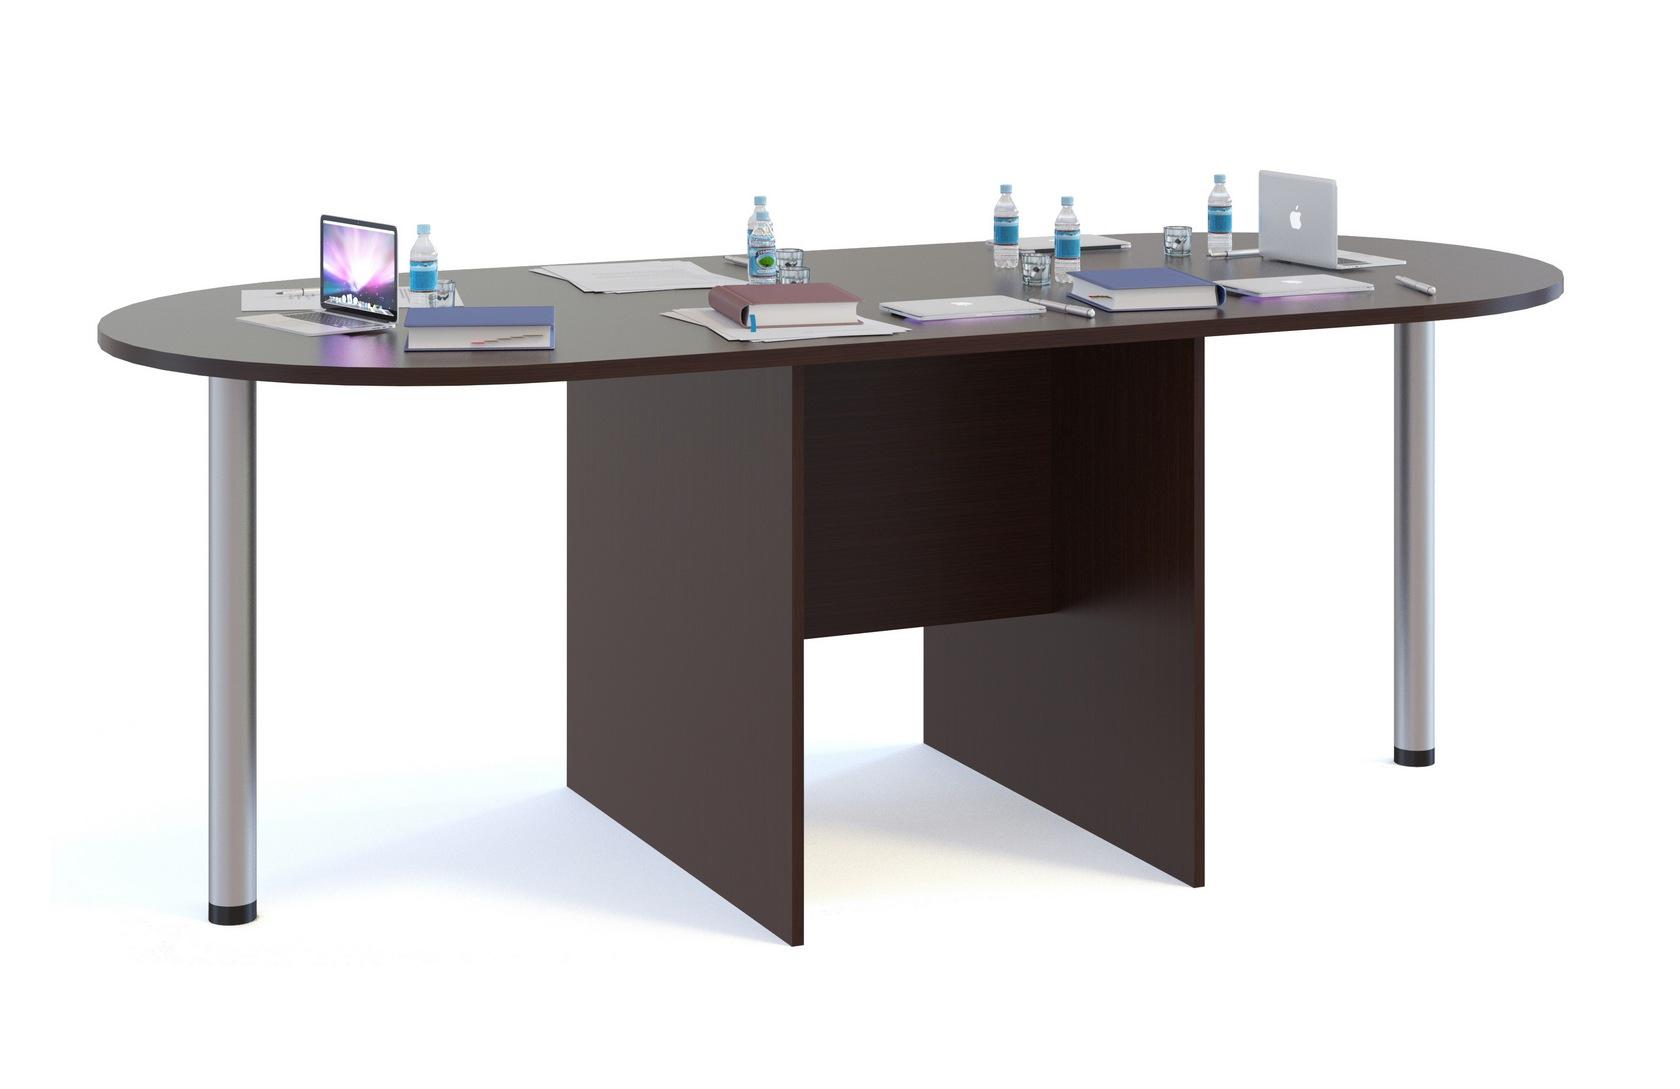 Стол для переговоров Сокол СПР-05+2 шт. СПР-03